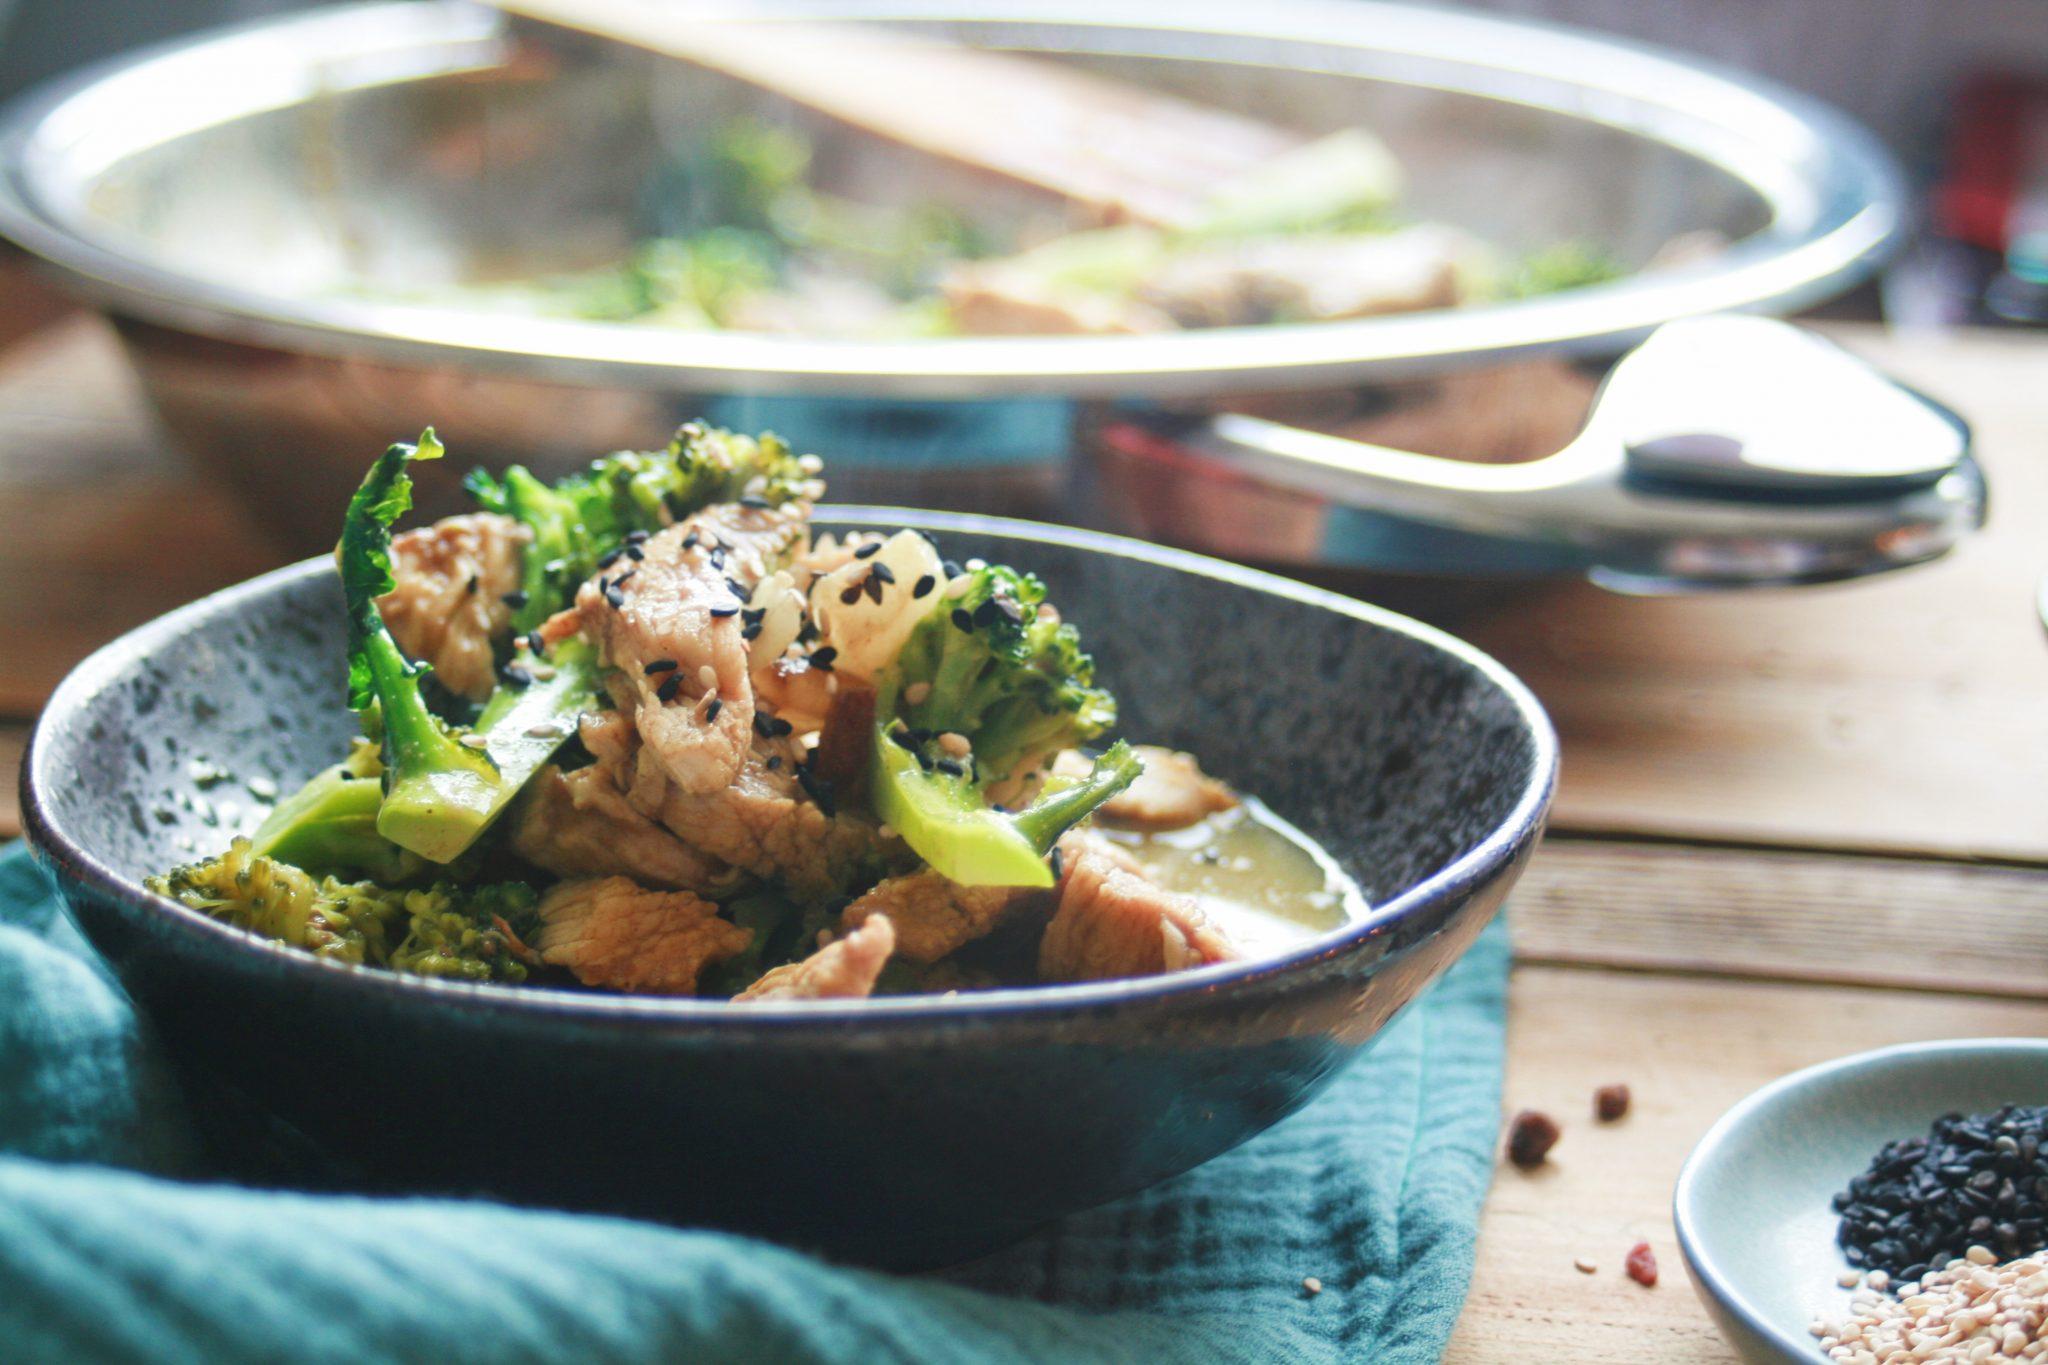 Kuracie s brokolicou